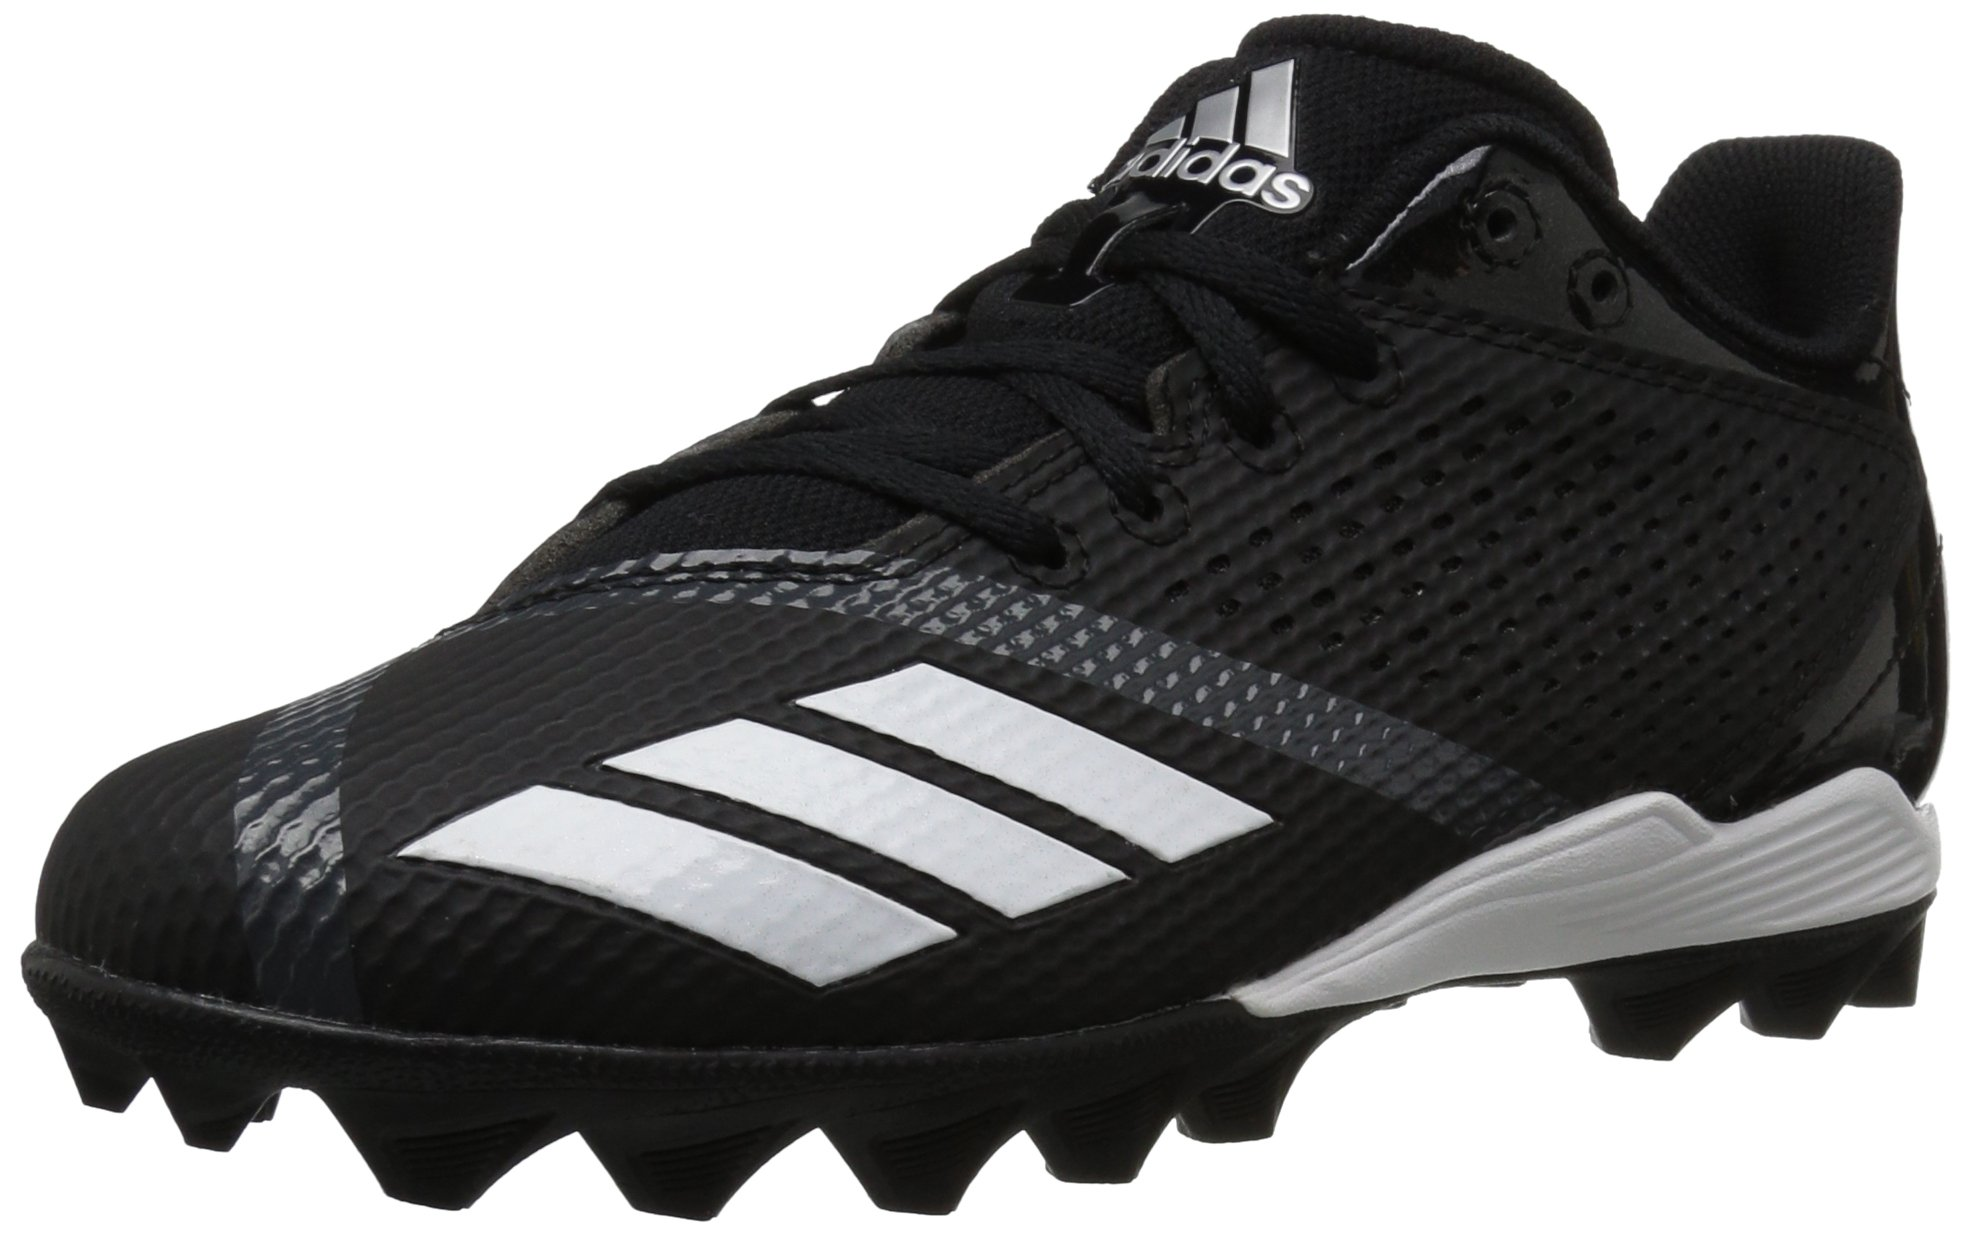 adidas Unisex 5-Star md Football Shoe, Black/White/Night Metallic, 6 M US Big Kid